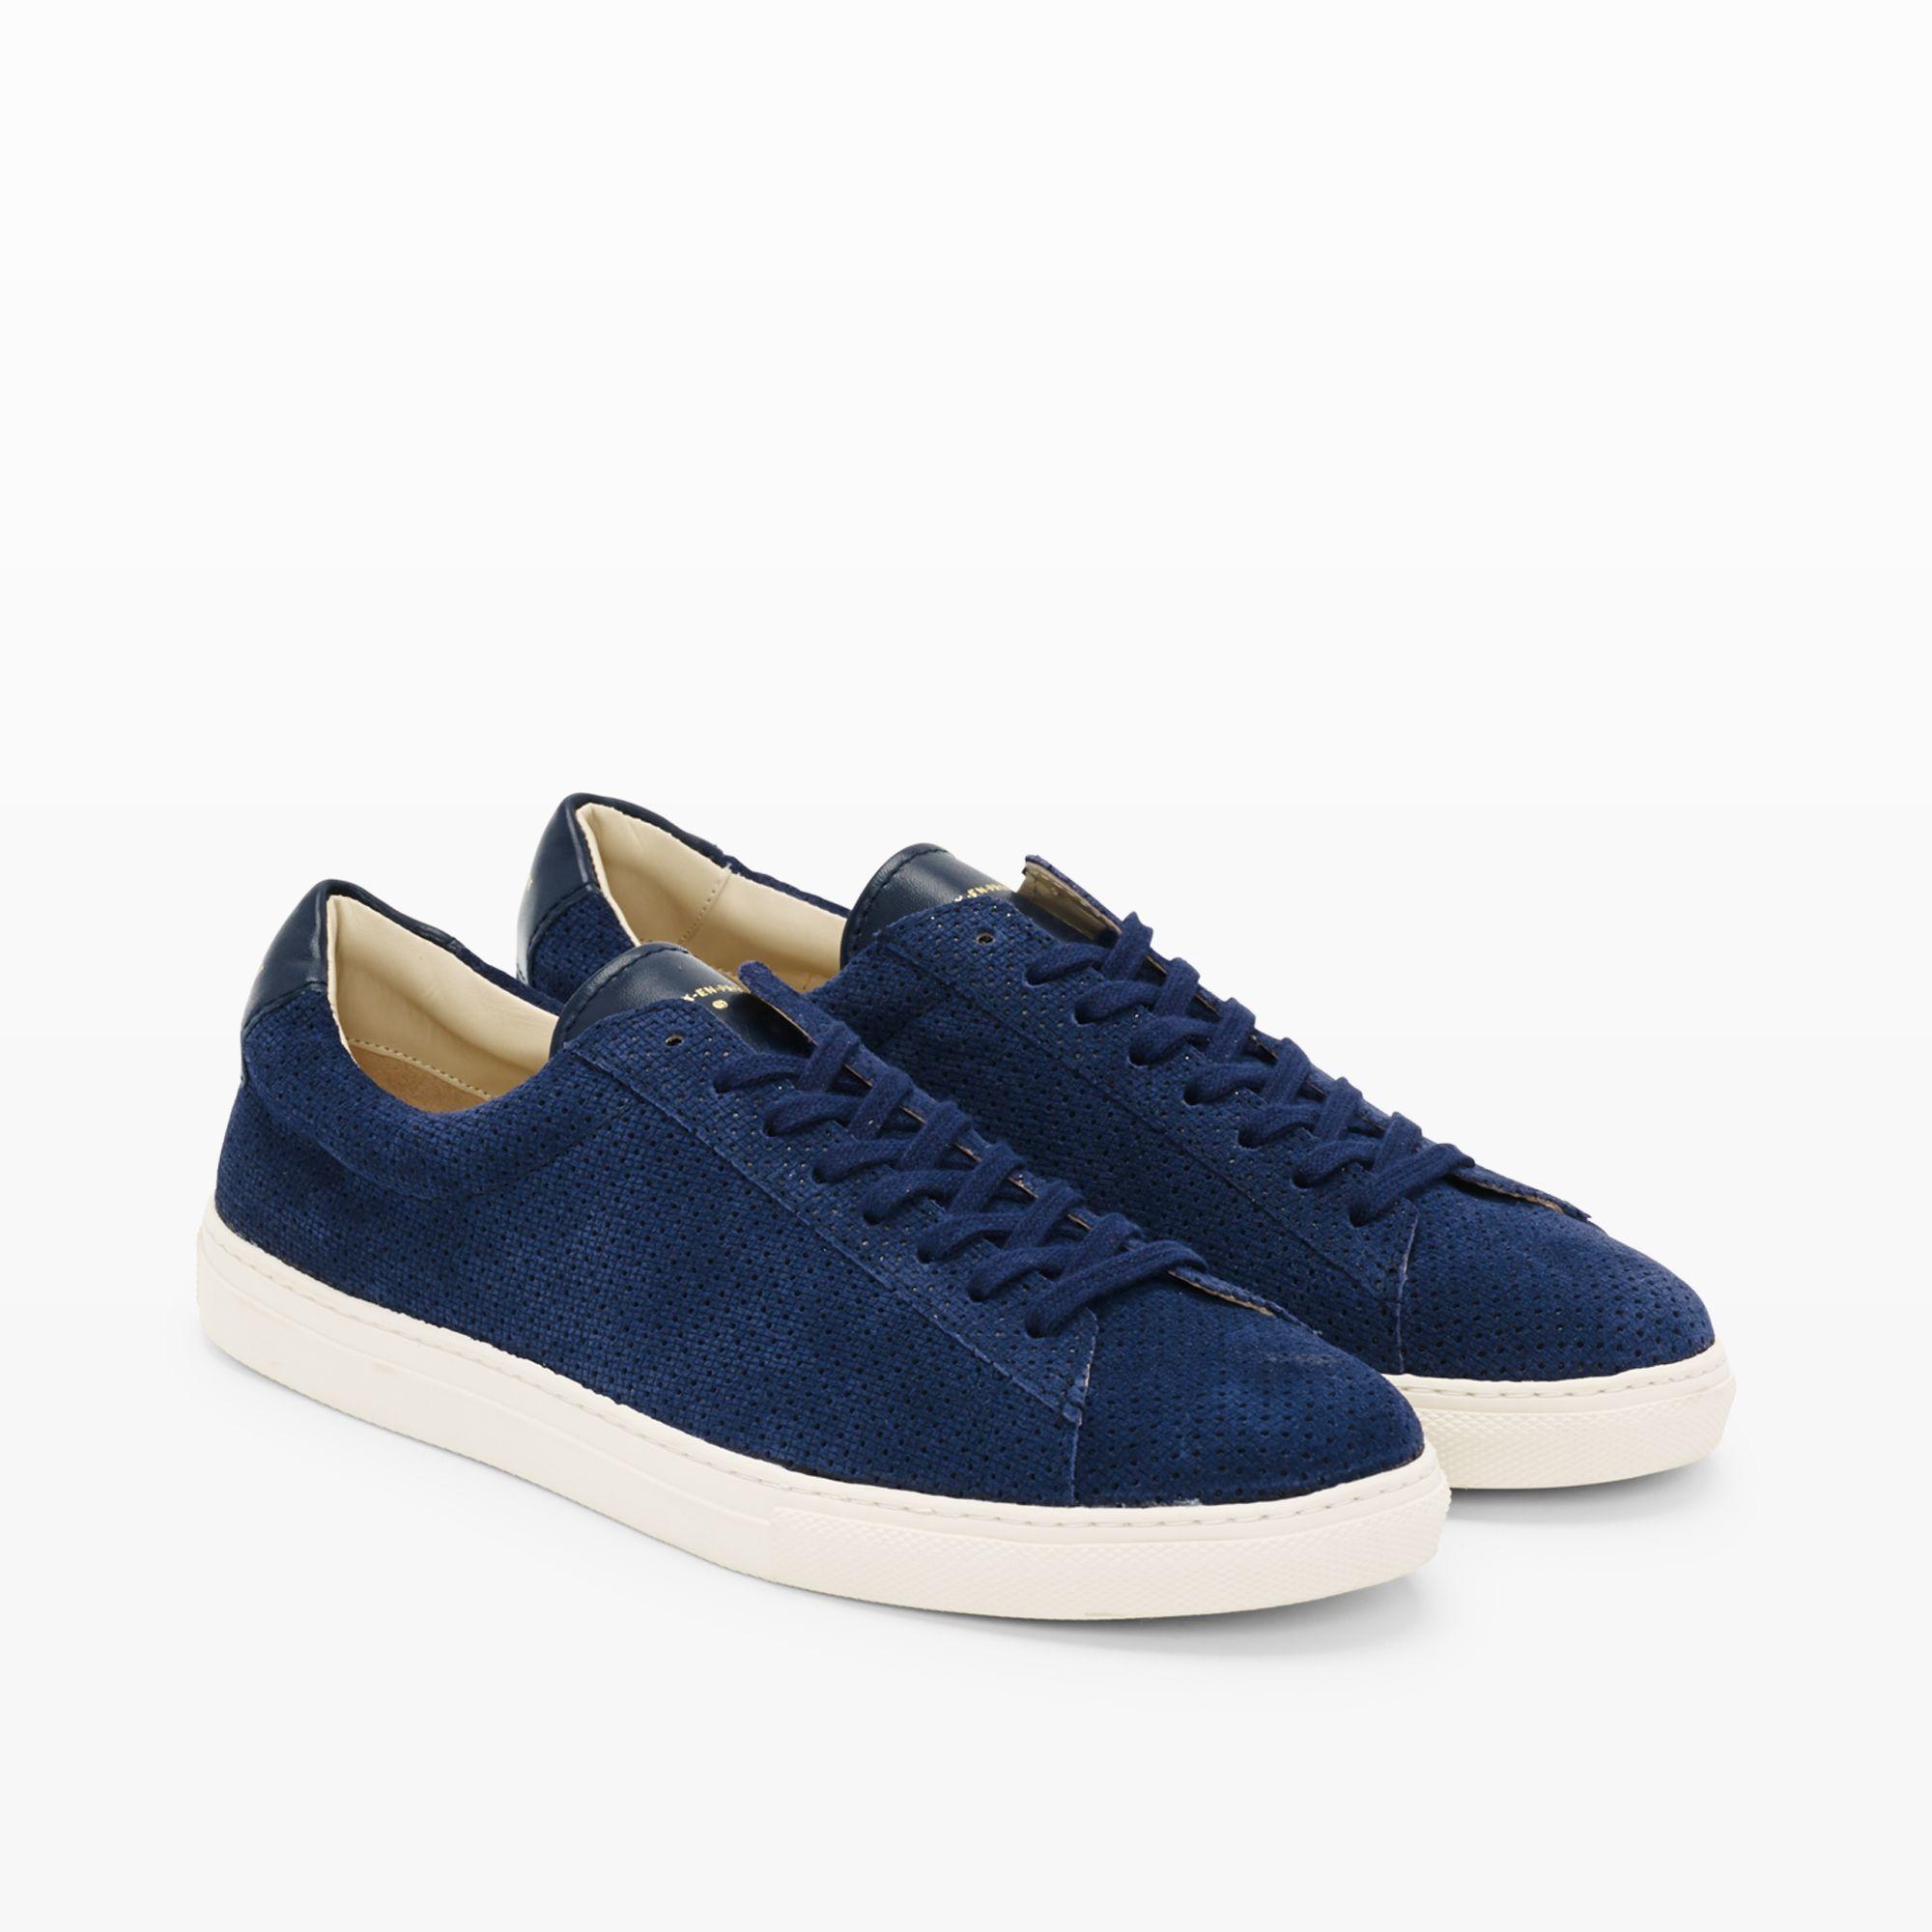 Lyst Club Monaco Zespa Perforated Suede Sneaker In Blue